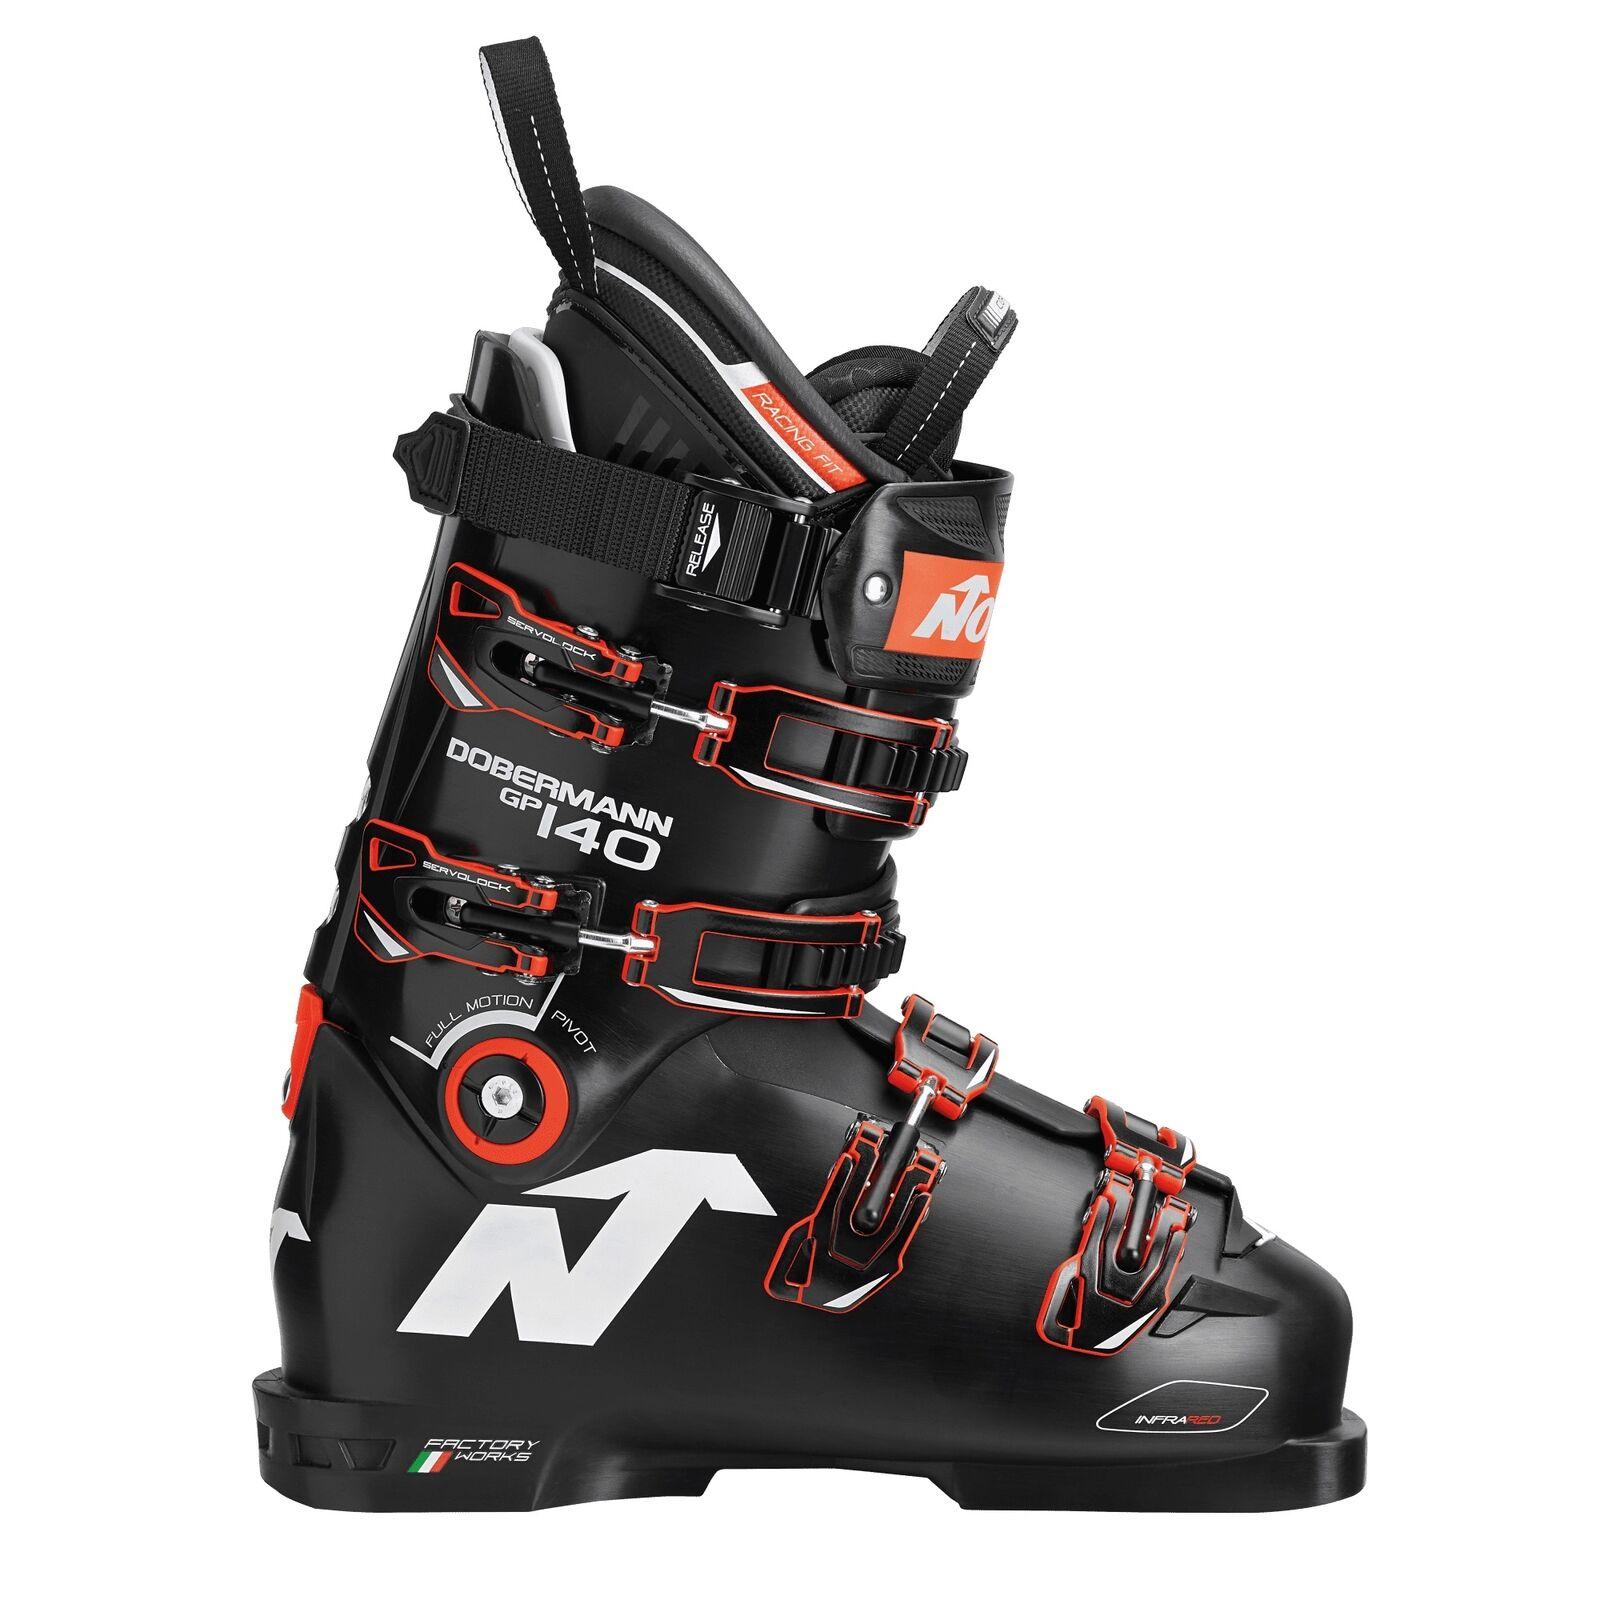 Nordica Dobermann Gp 140 - scarponi da sci uomo